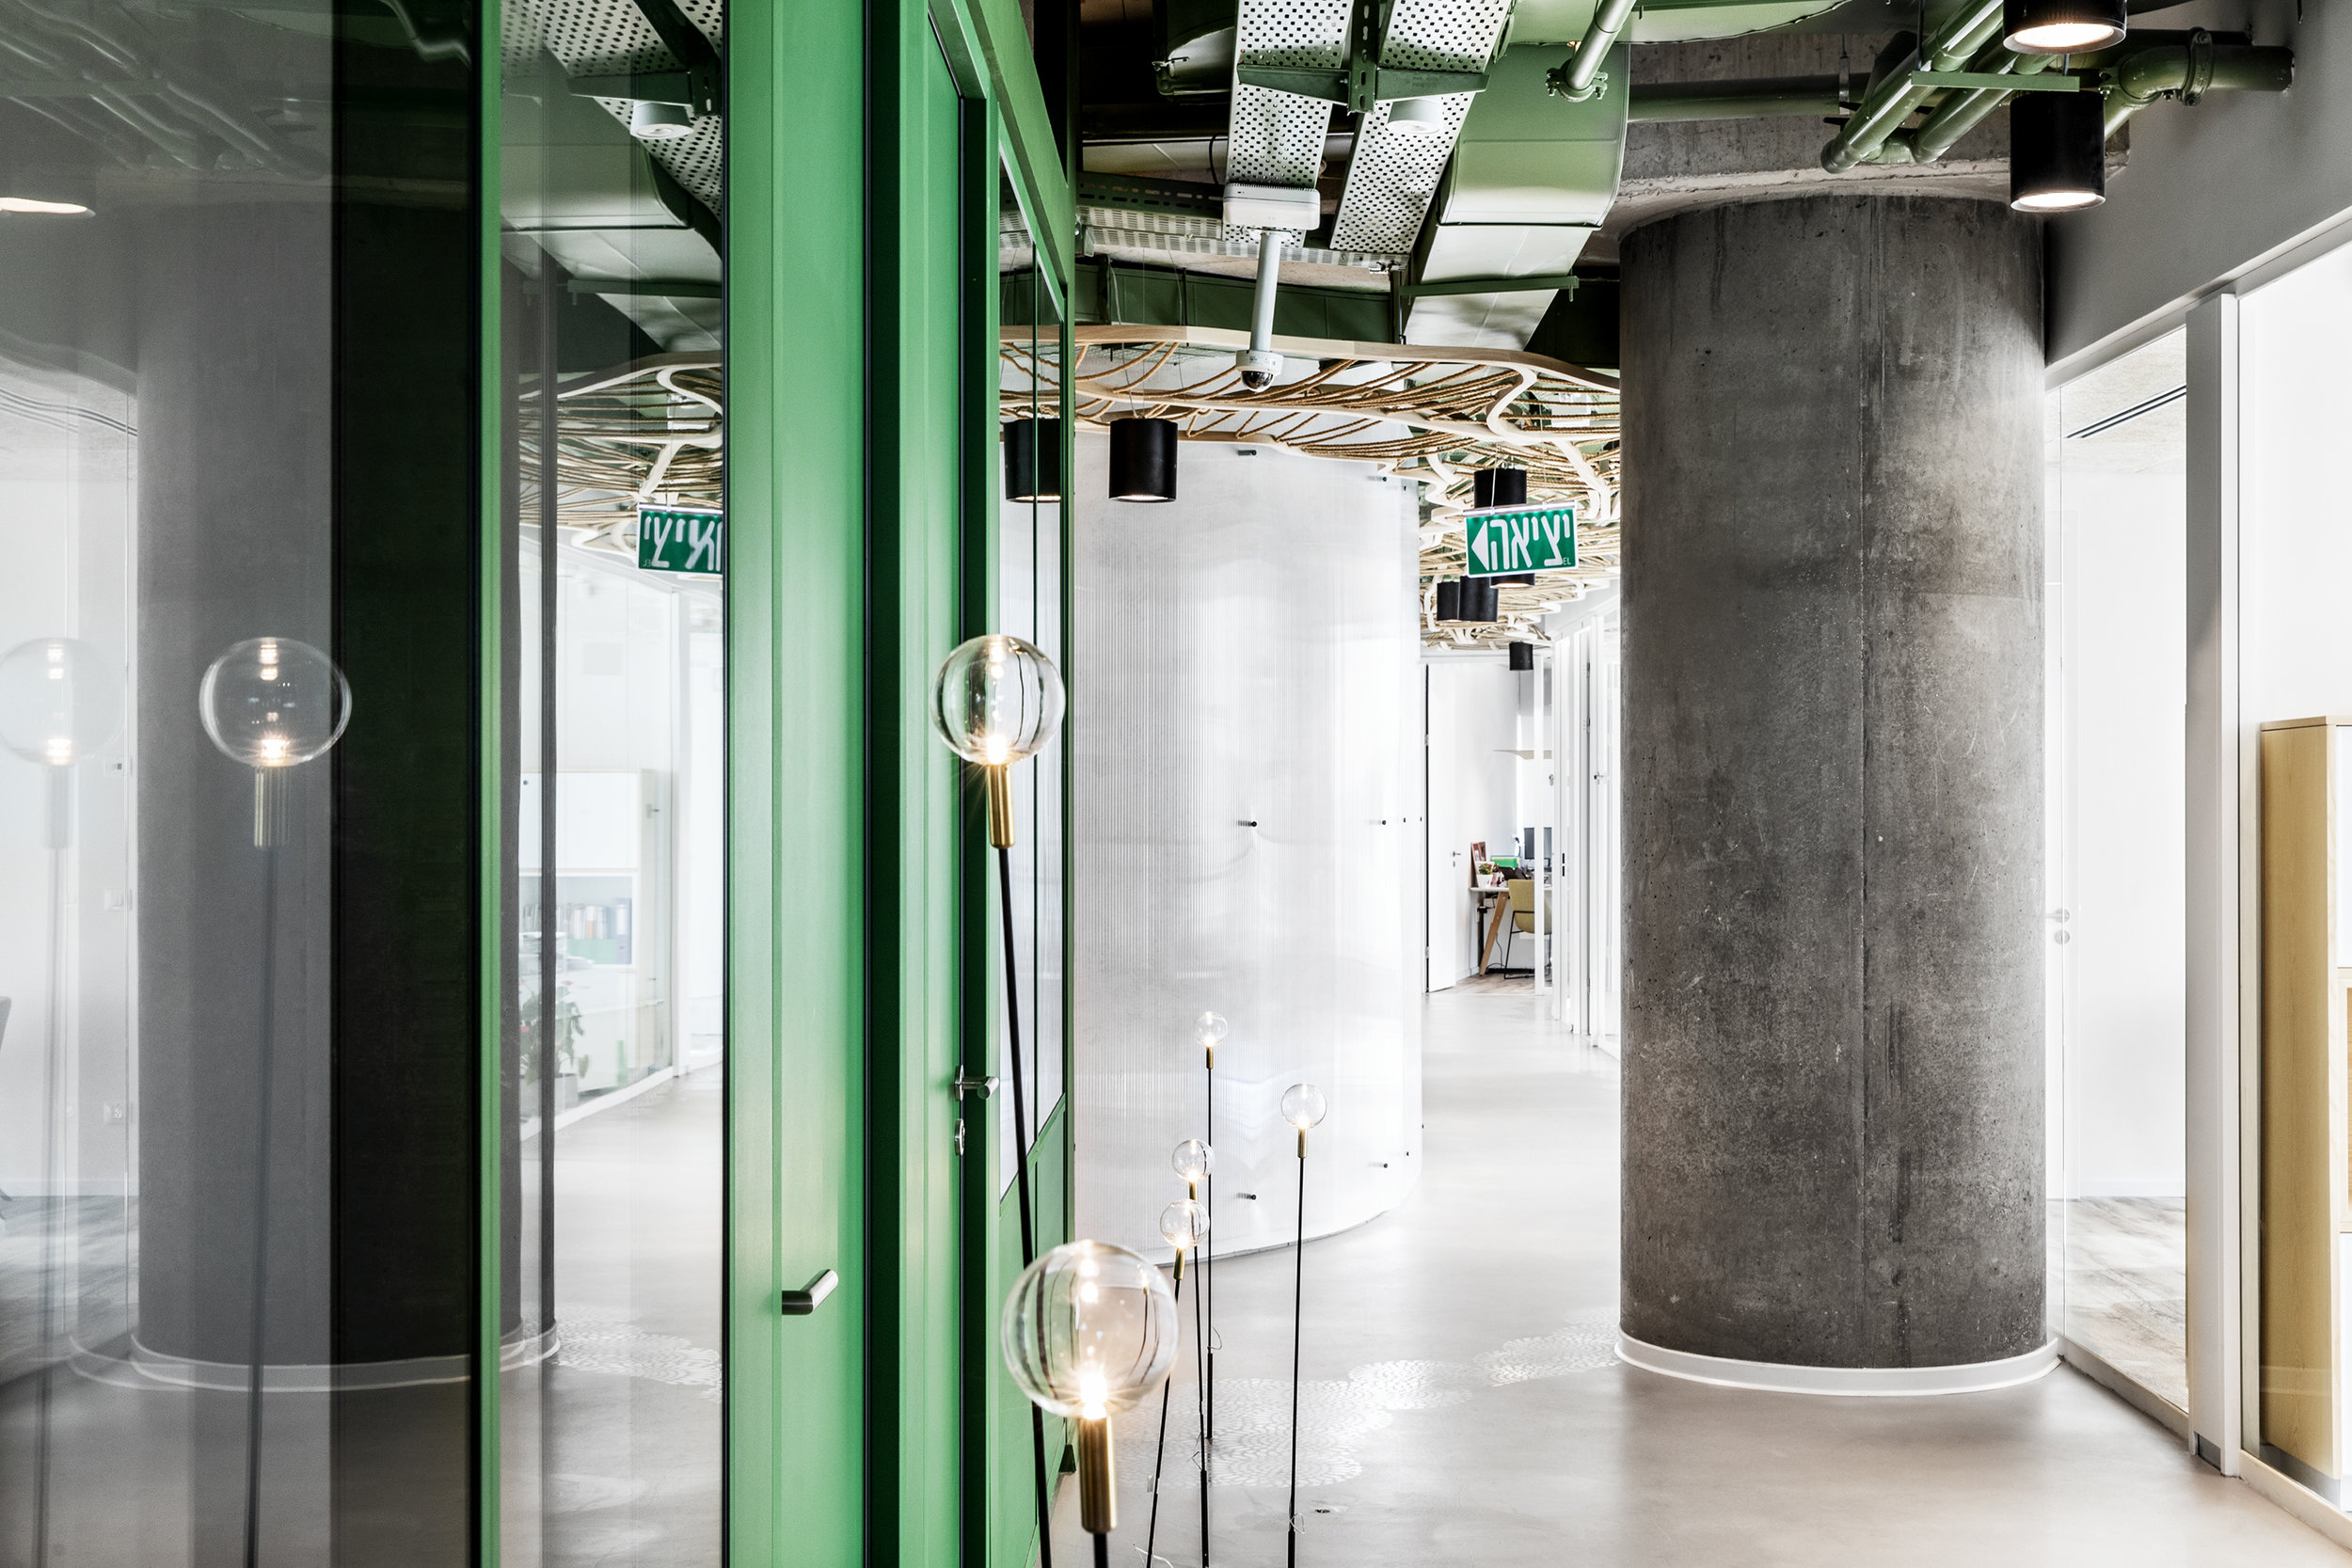 HINNOMAN - ROY DAVID ARCHTECTURE - STUDIO - סטודיו רואי דוד - אדריכלים (19).jpg